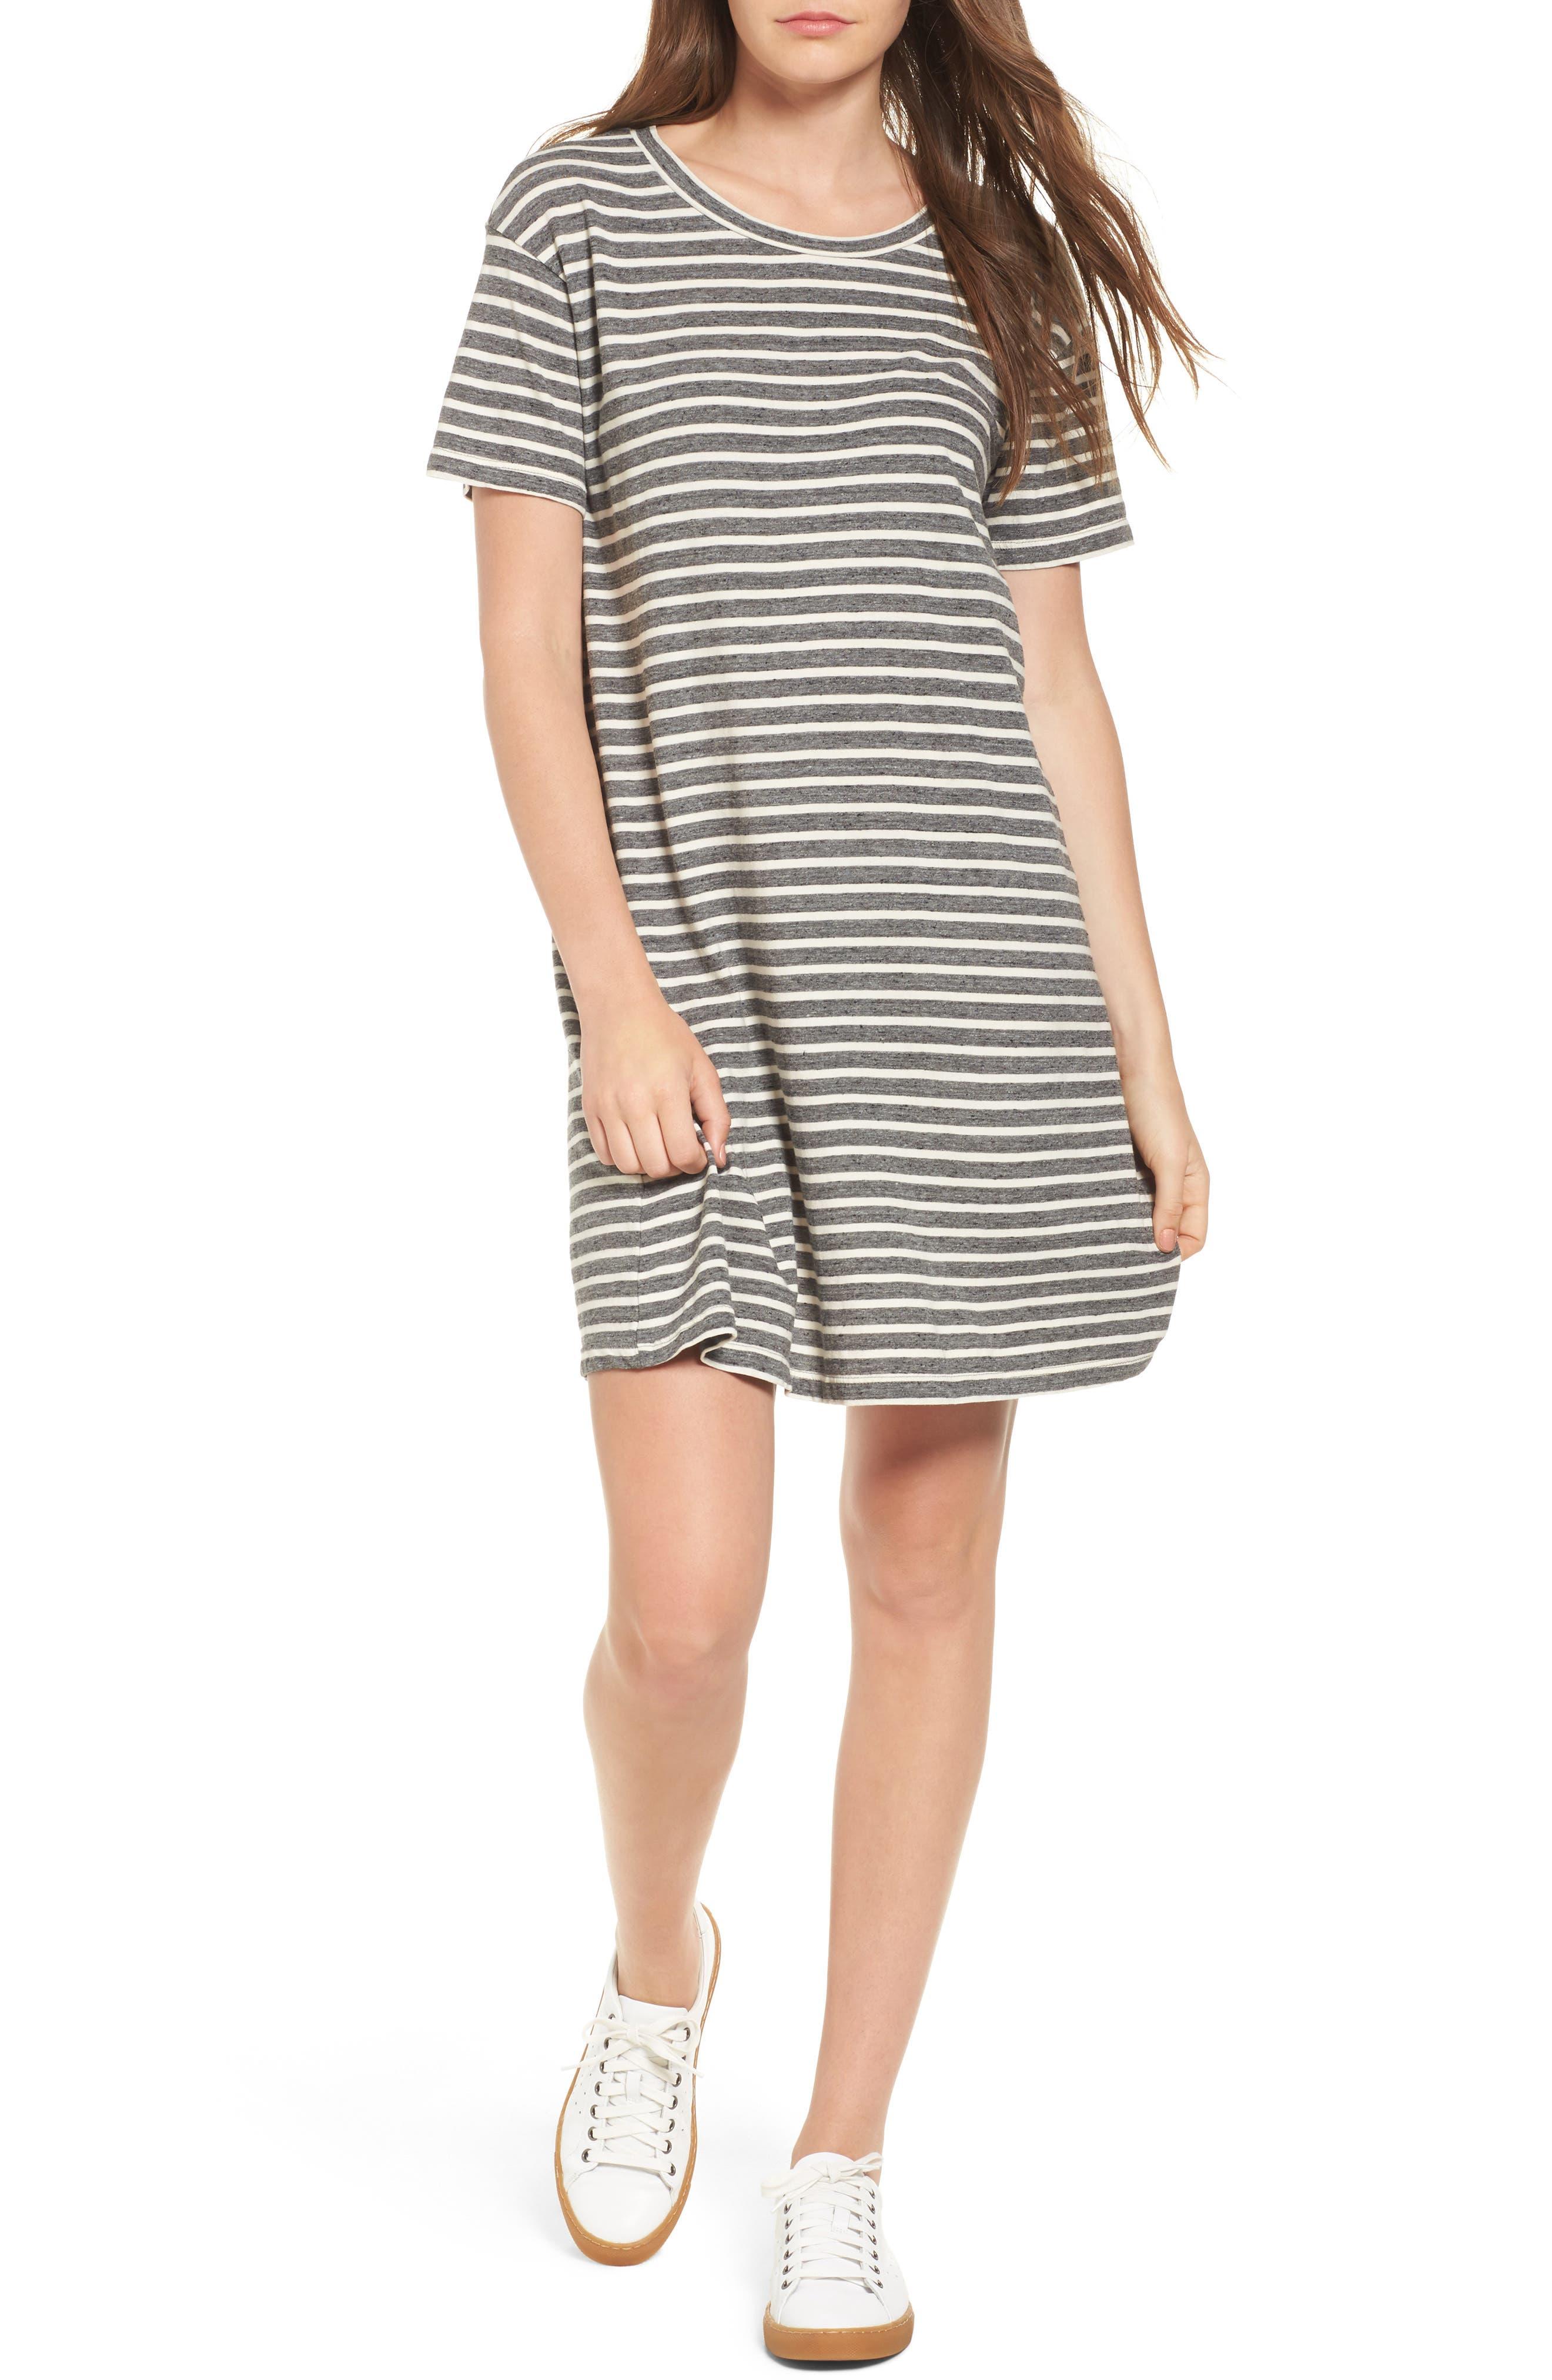 Main Image - Current/Elliott Stripe Knit T-Shirt Dress